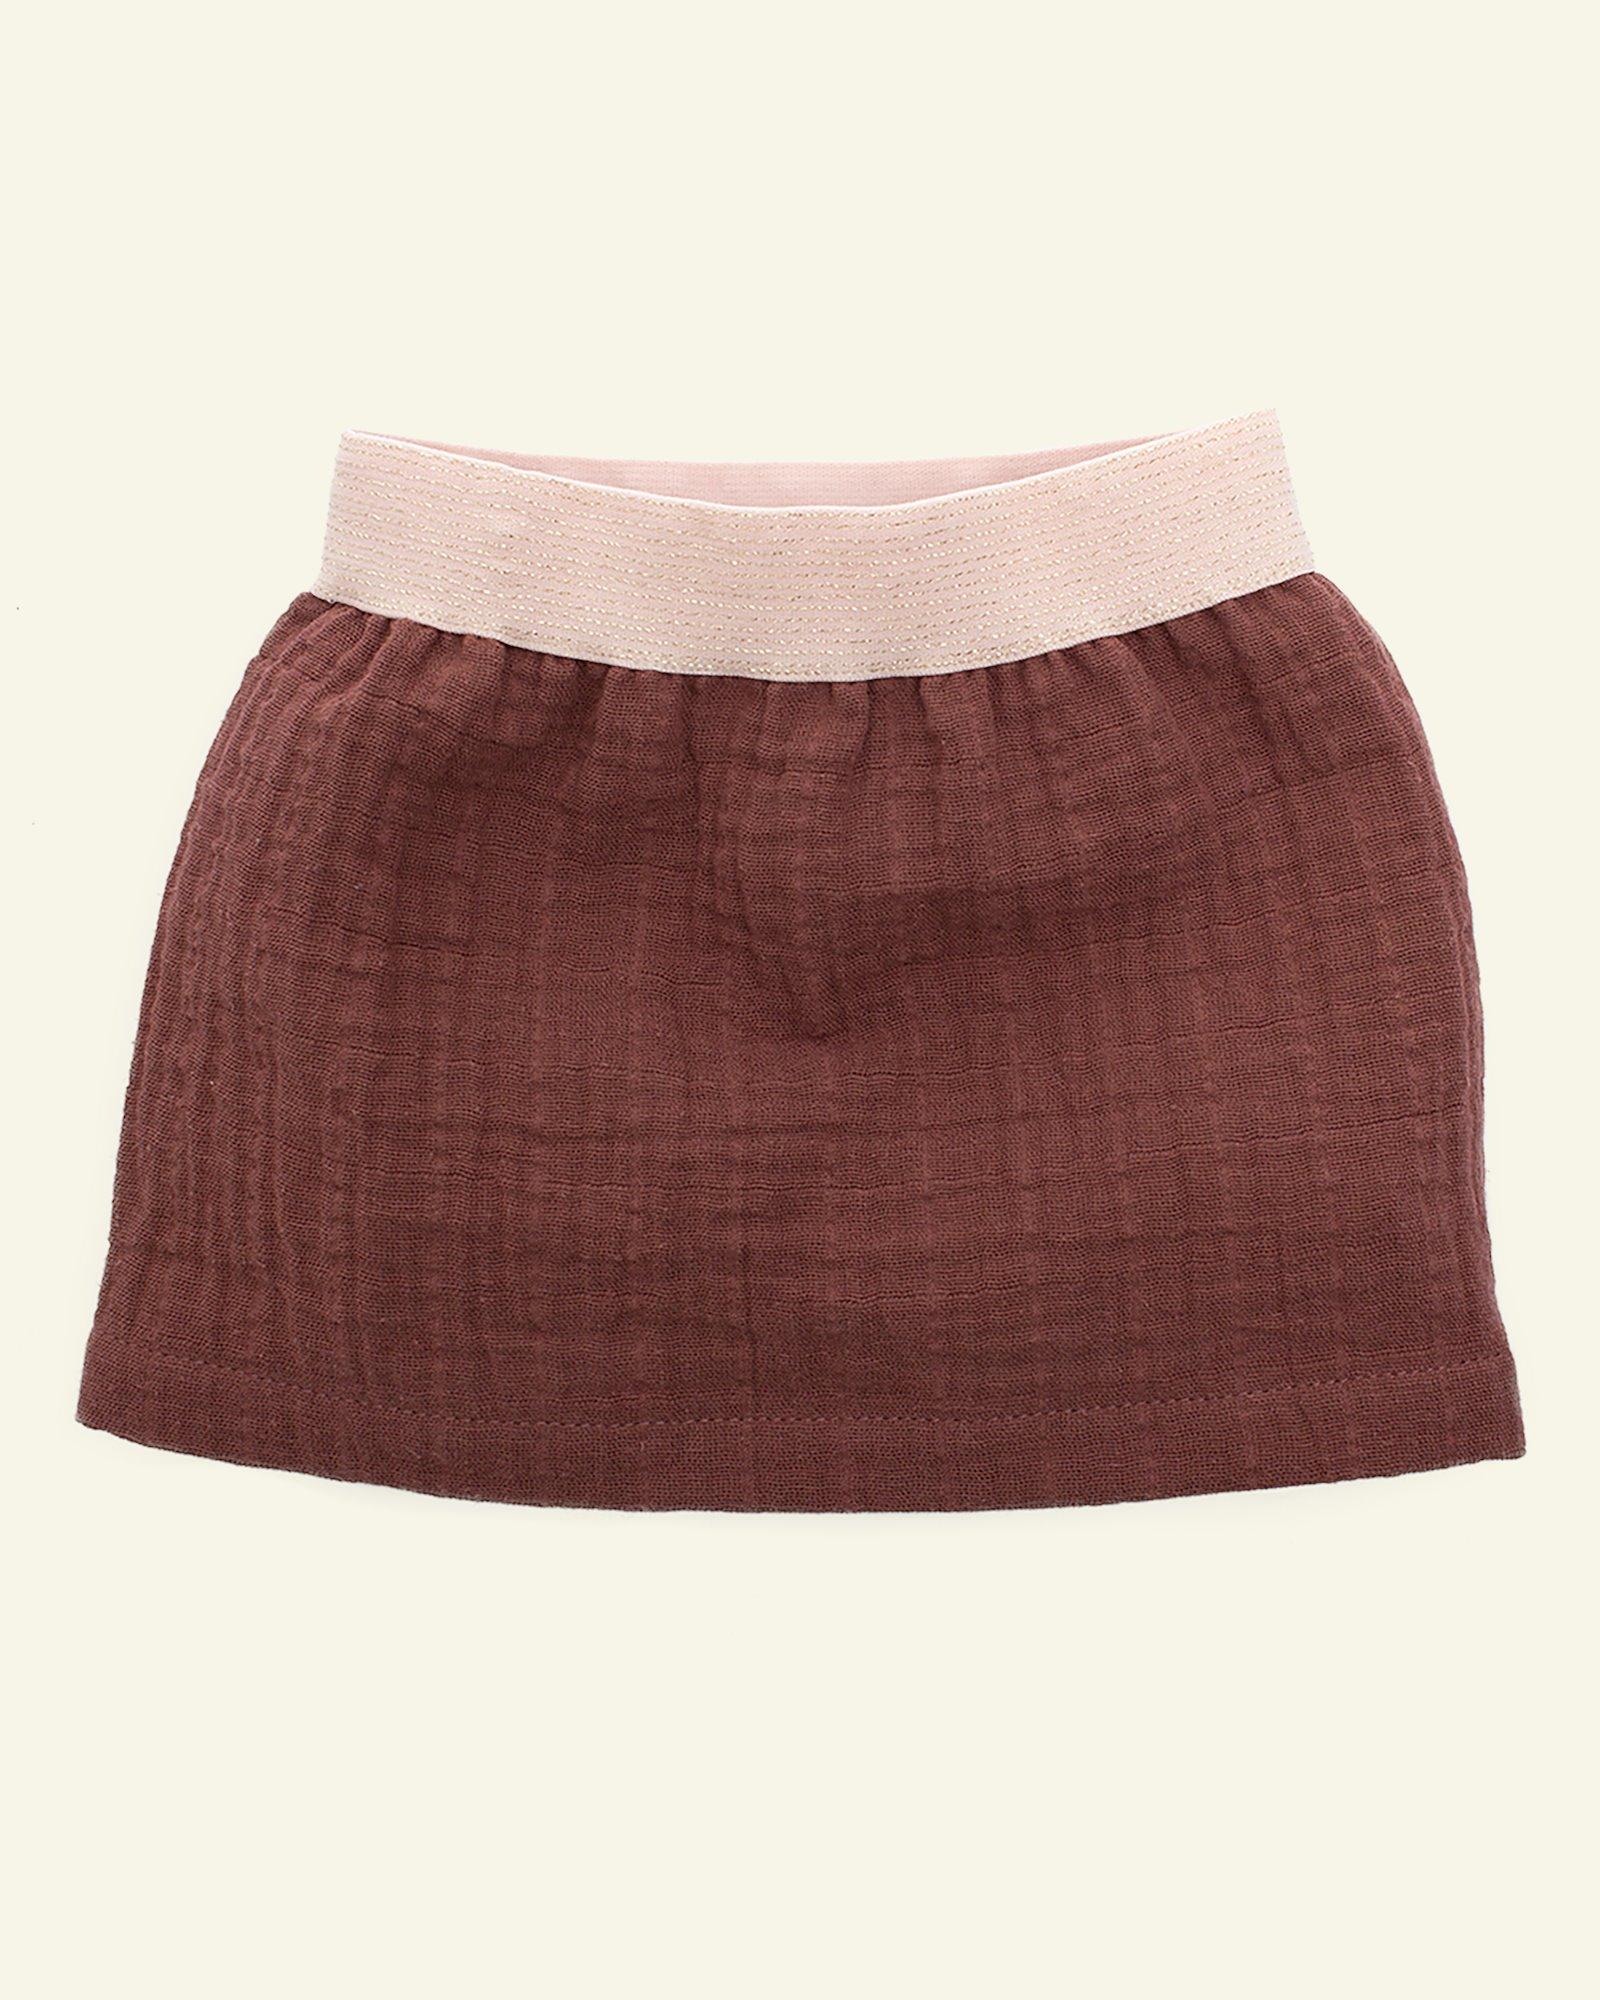 Skirt with elasticated waist